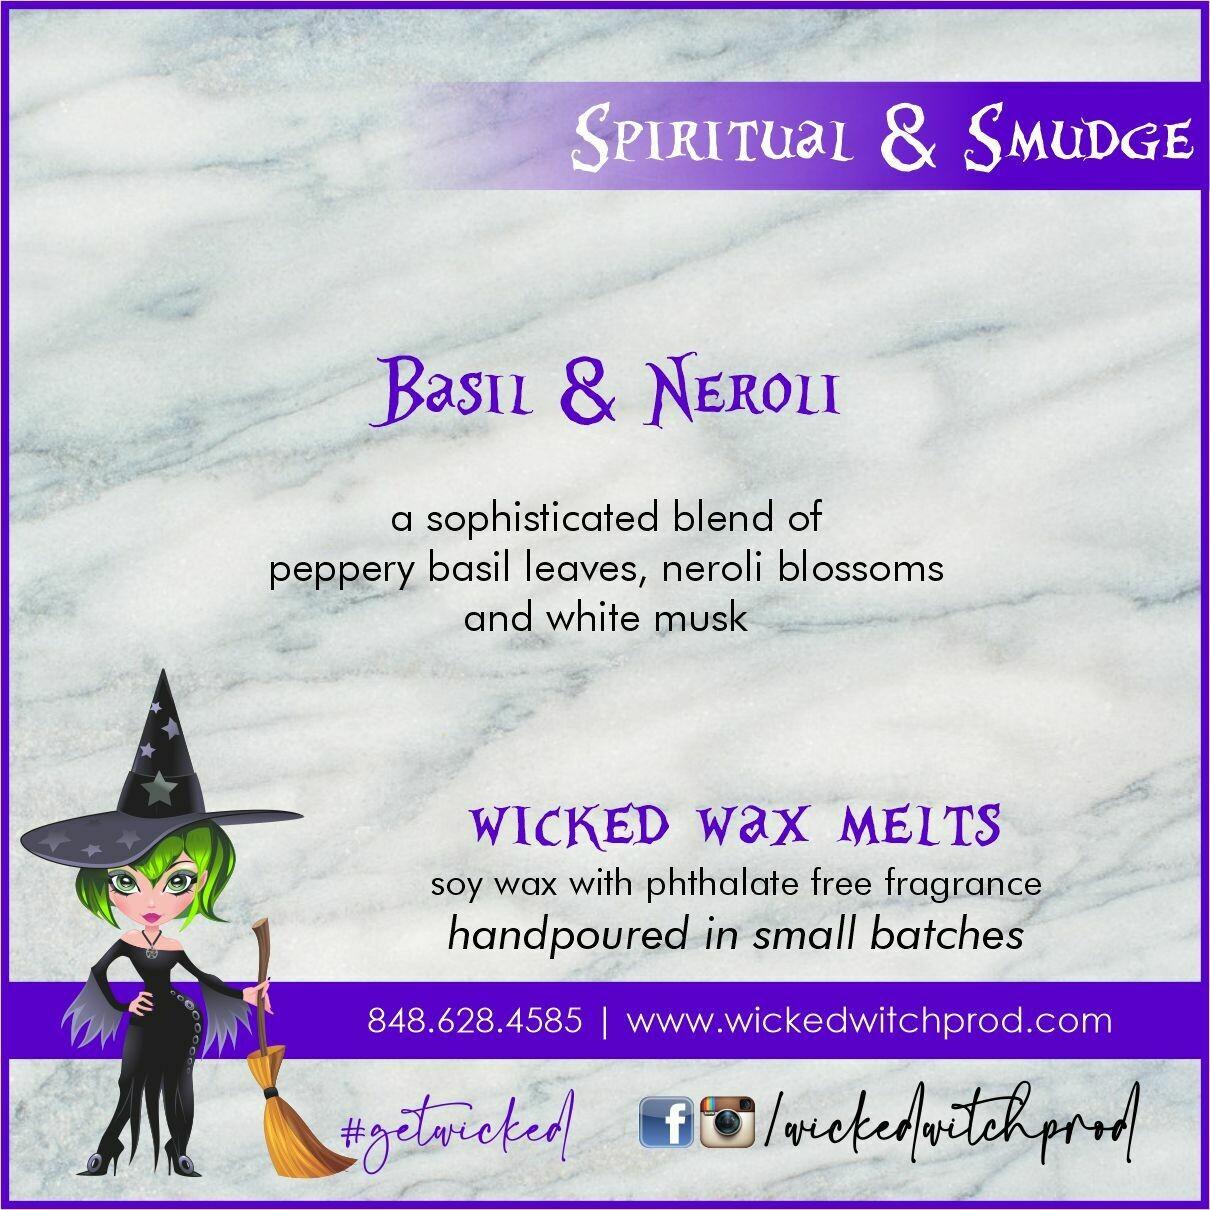 Basil & Neroli Wicked Wax Melts